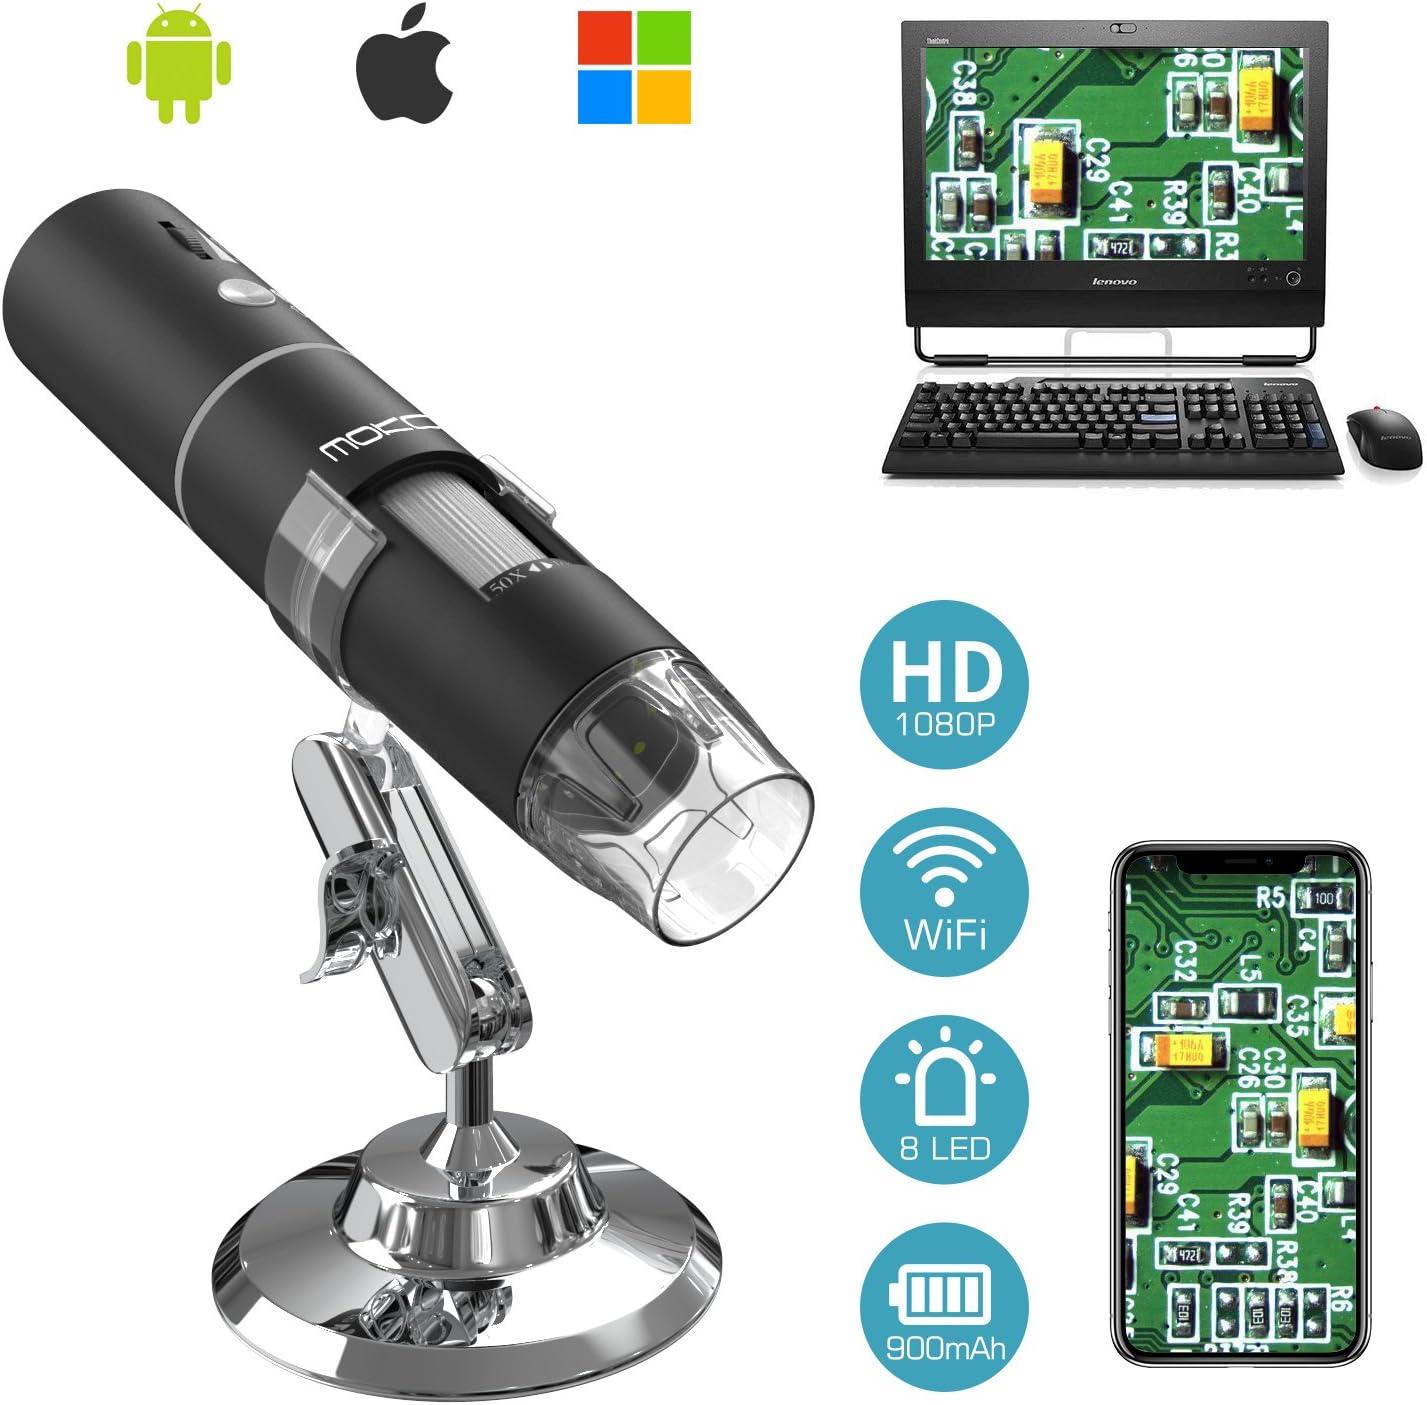 110-240 V Garsent Bluetooth Quittungsdrucker Mini Wirless Mobile Thermodrucker WiFi Bondrucker f/ür Android iOS Windows Handys EU